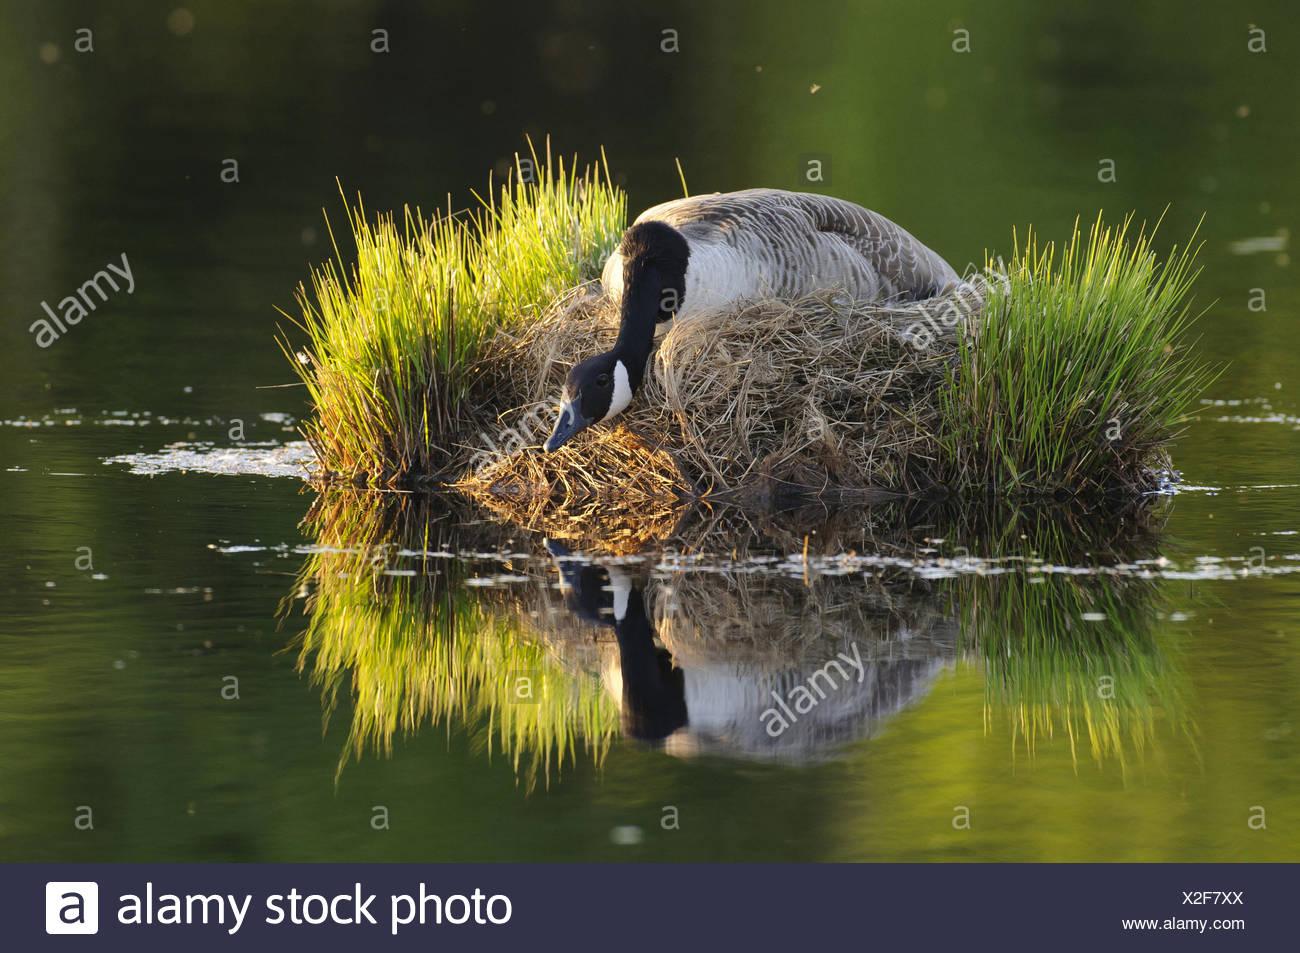 canada goose allemagne